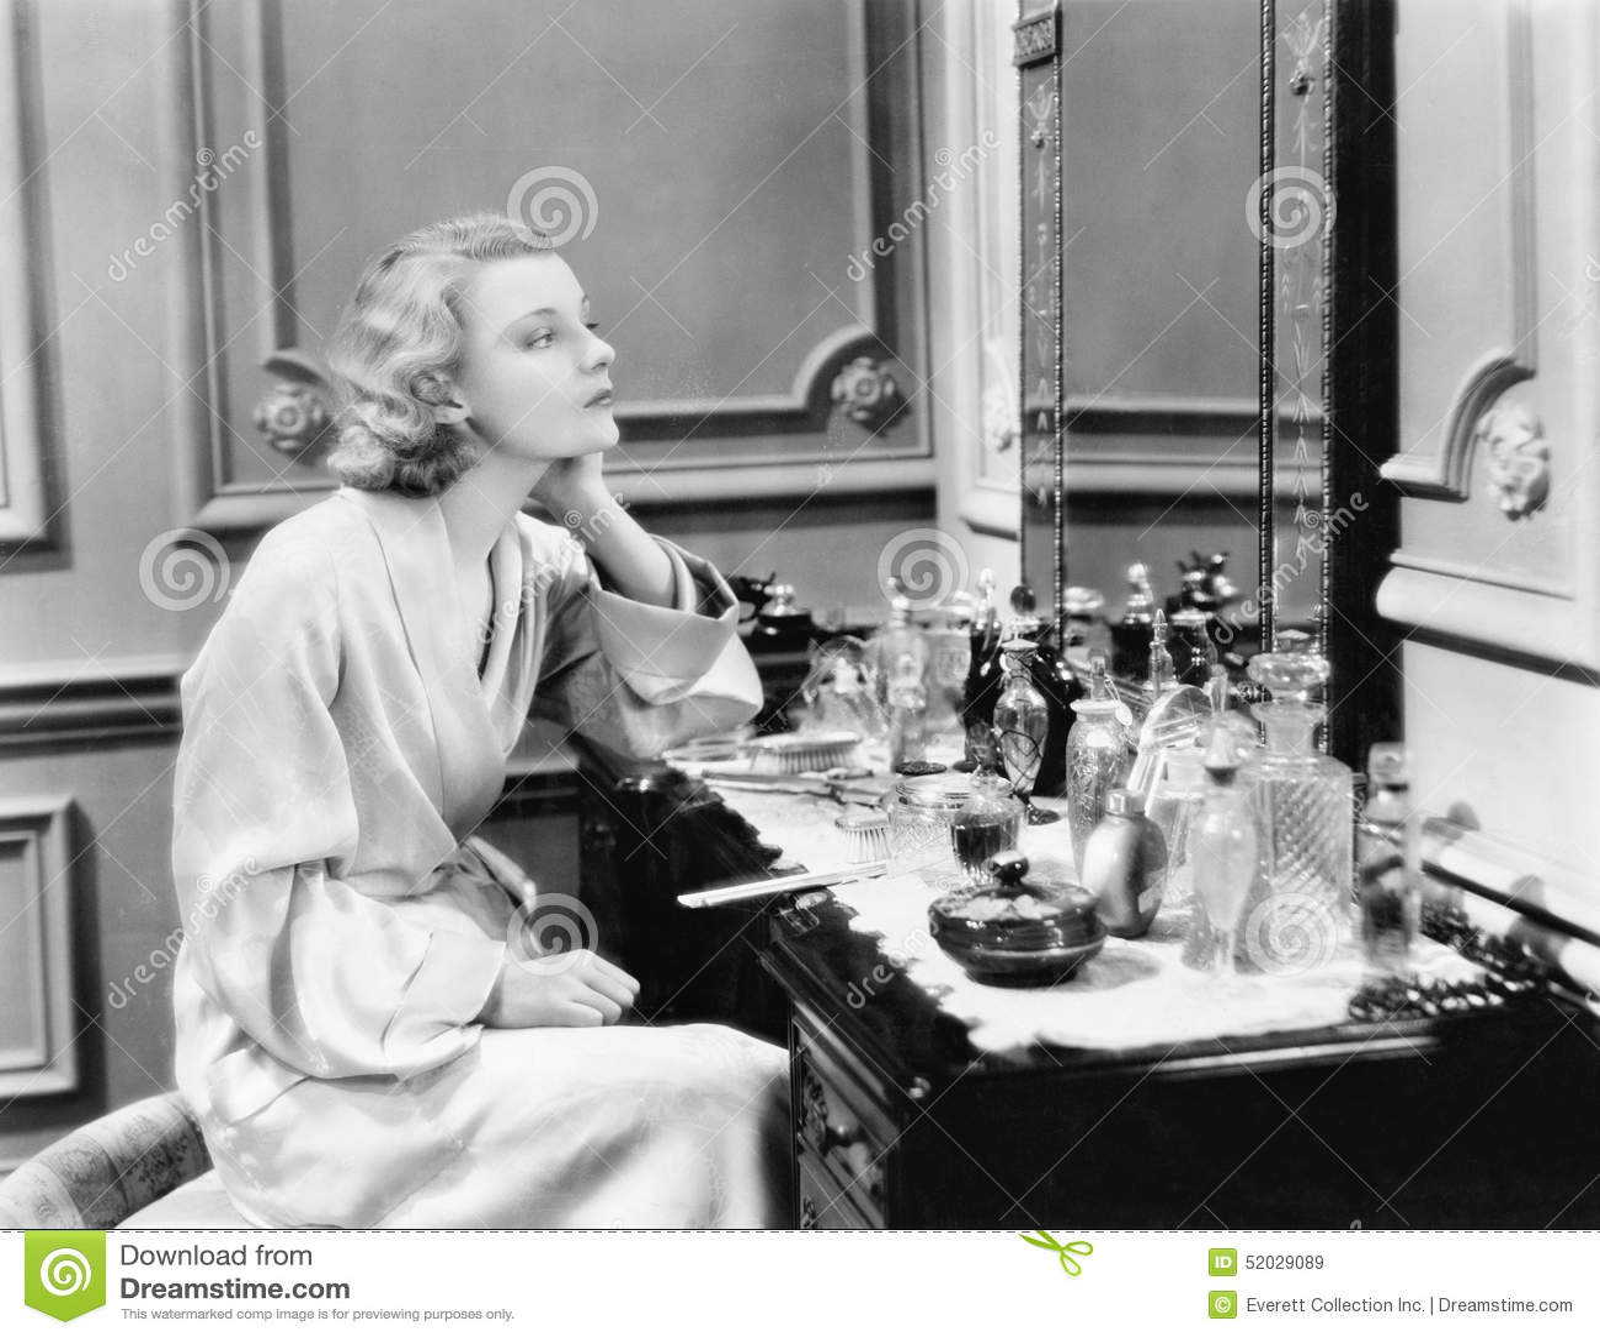 Women and vanity